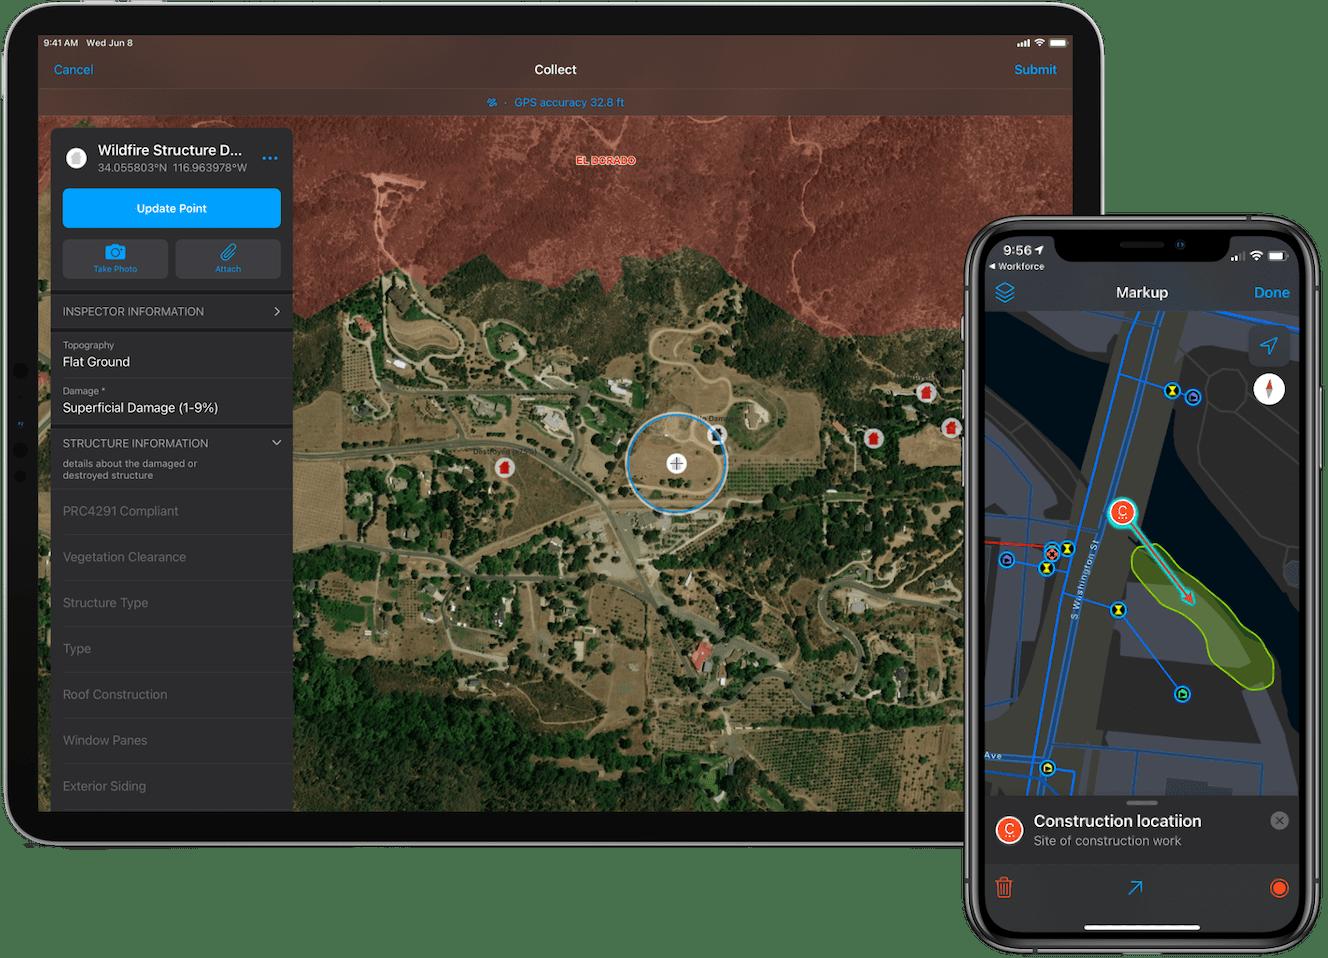 ArcGIS Field Maps supports Dark Mode